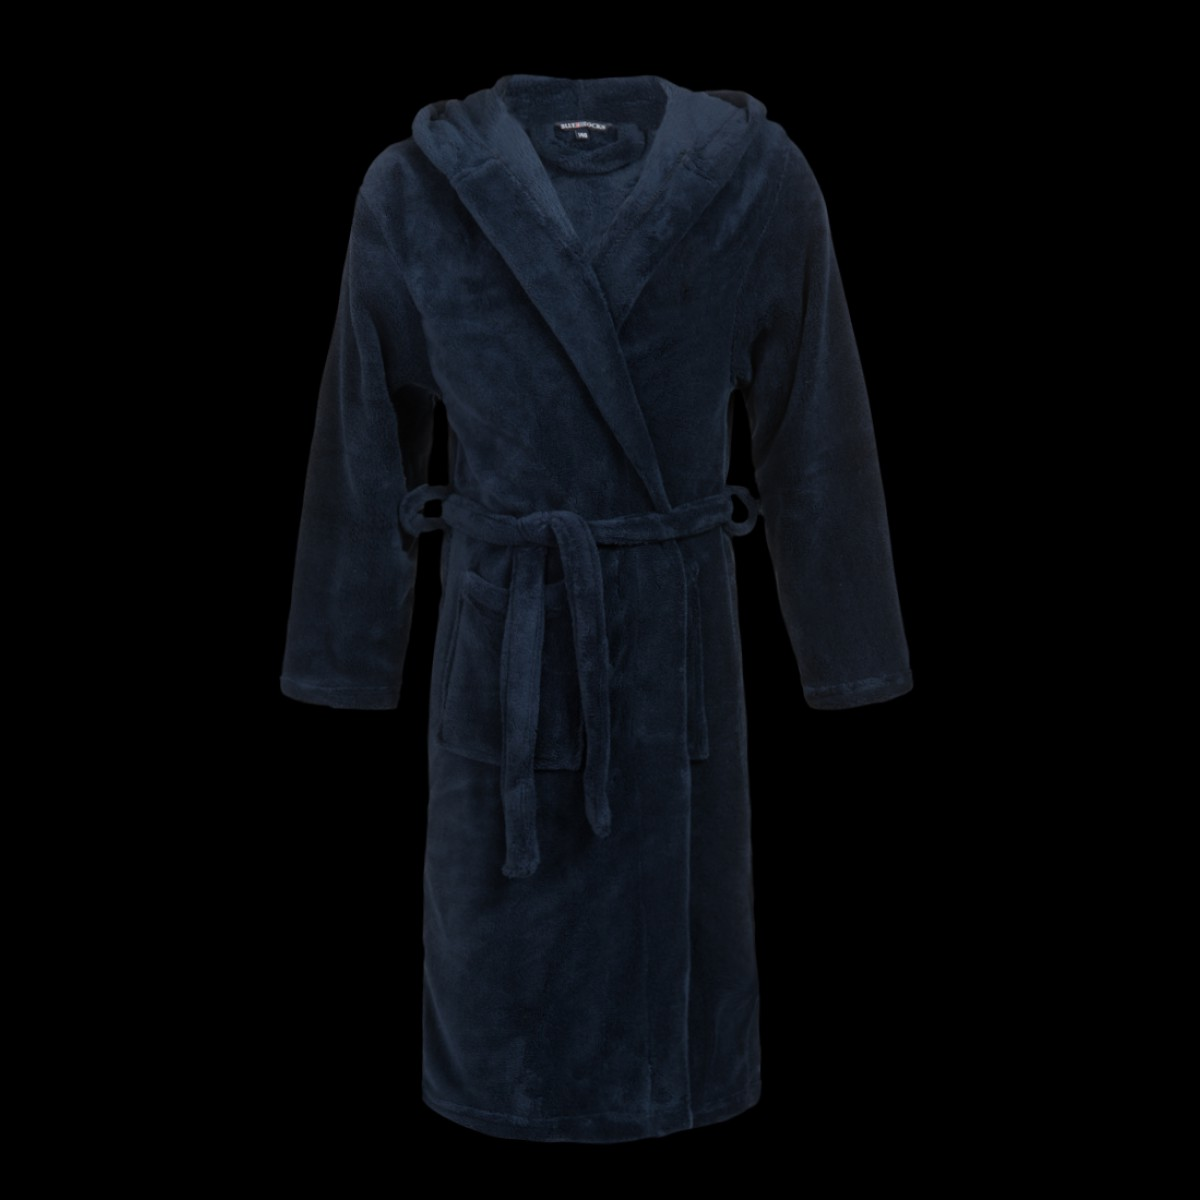 Donkerblauwe kinderbadjas